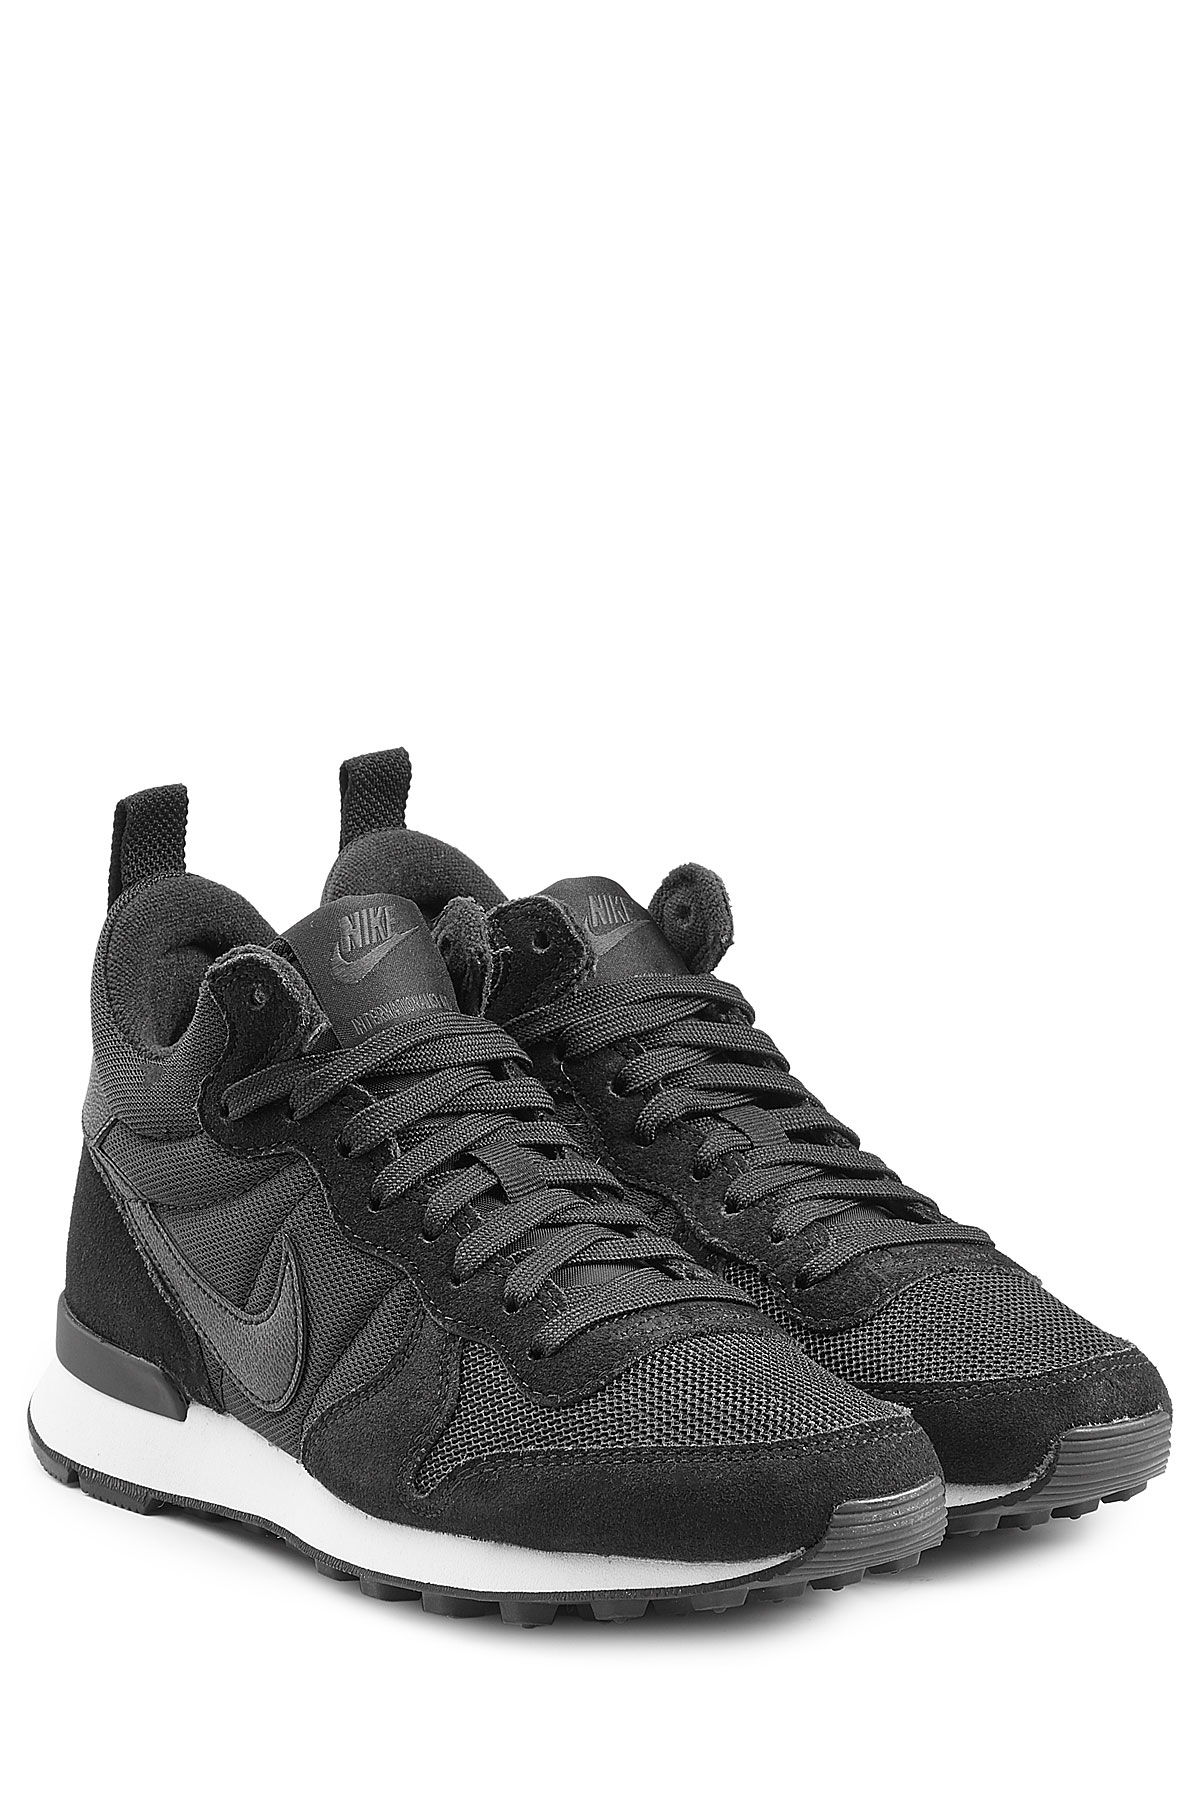 nike sneaker internationalist leather mid